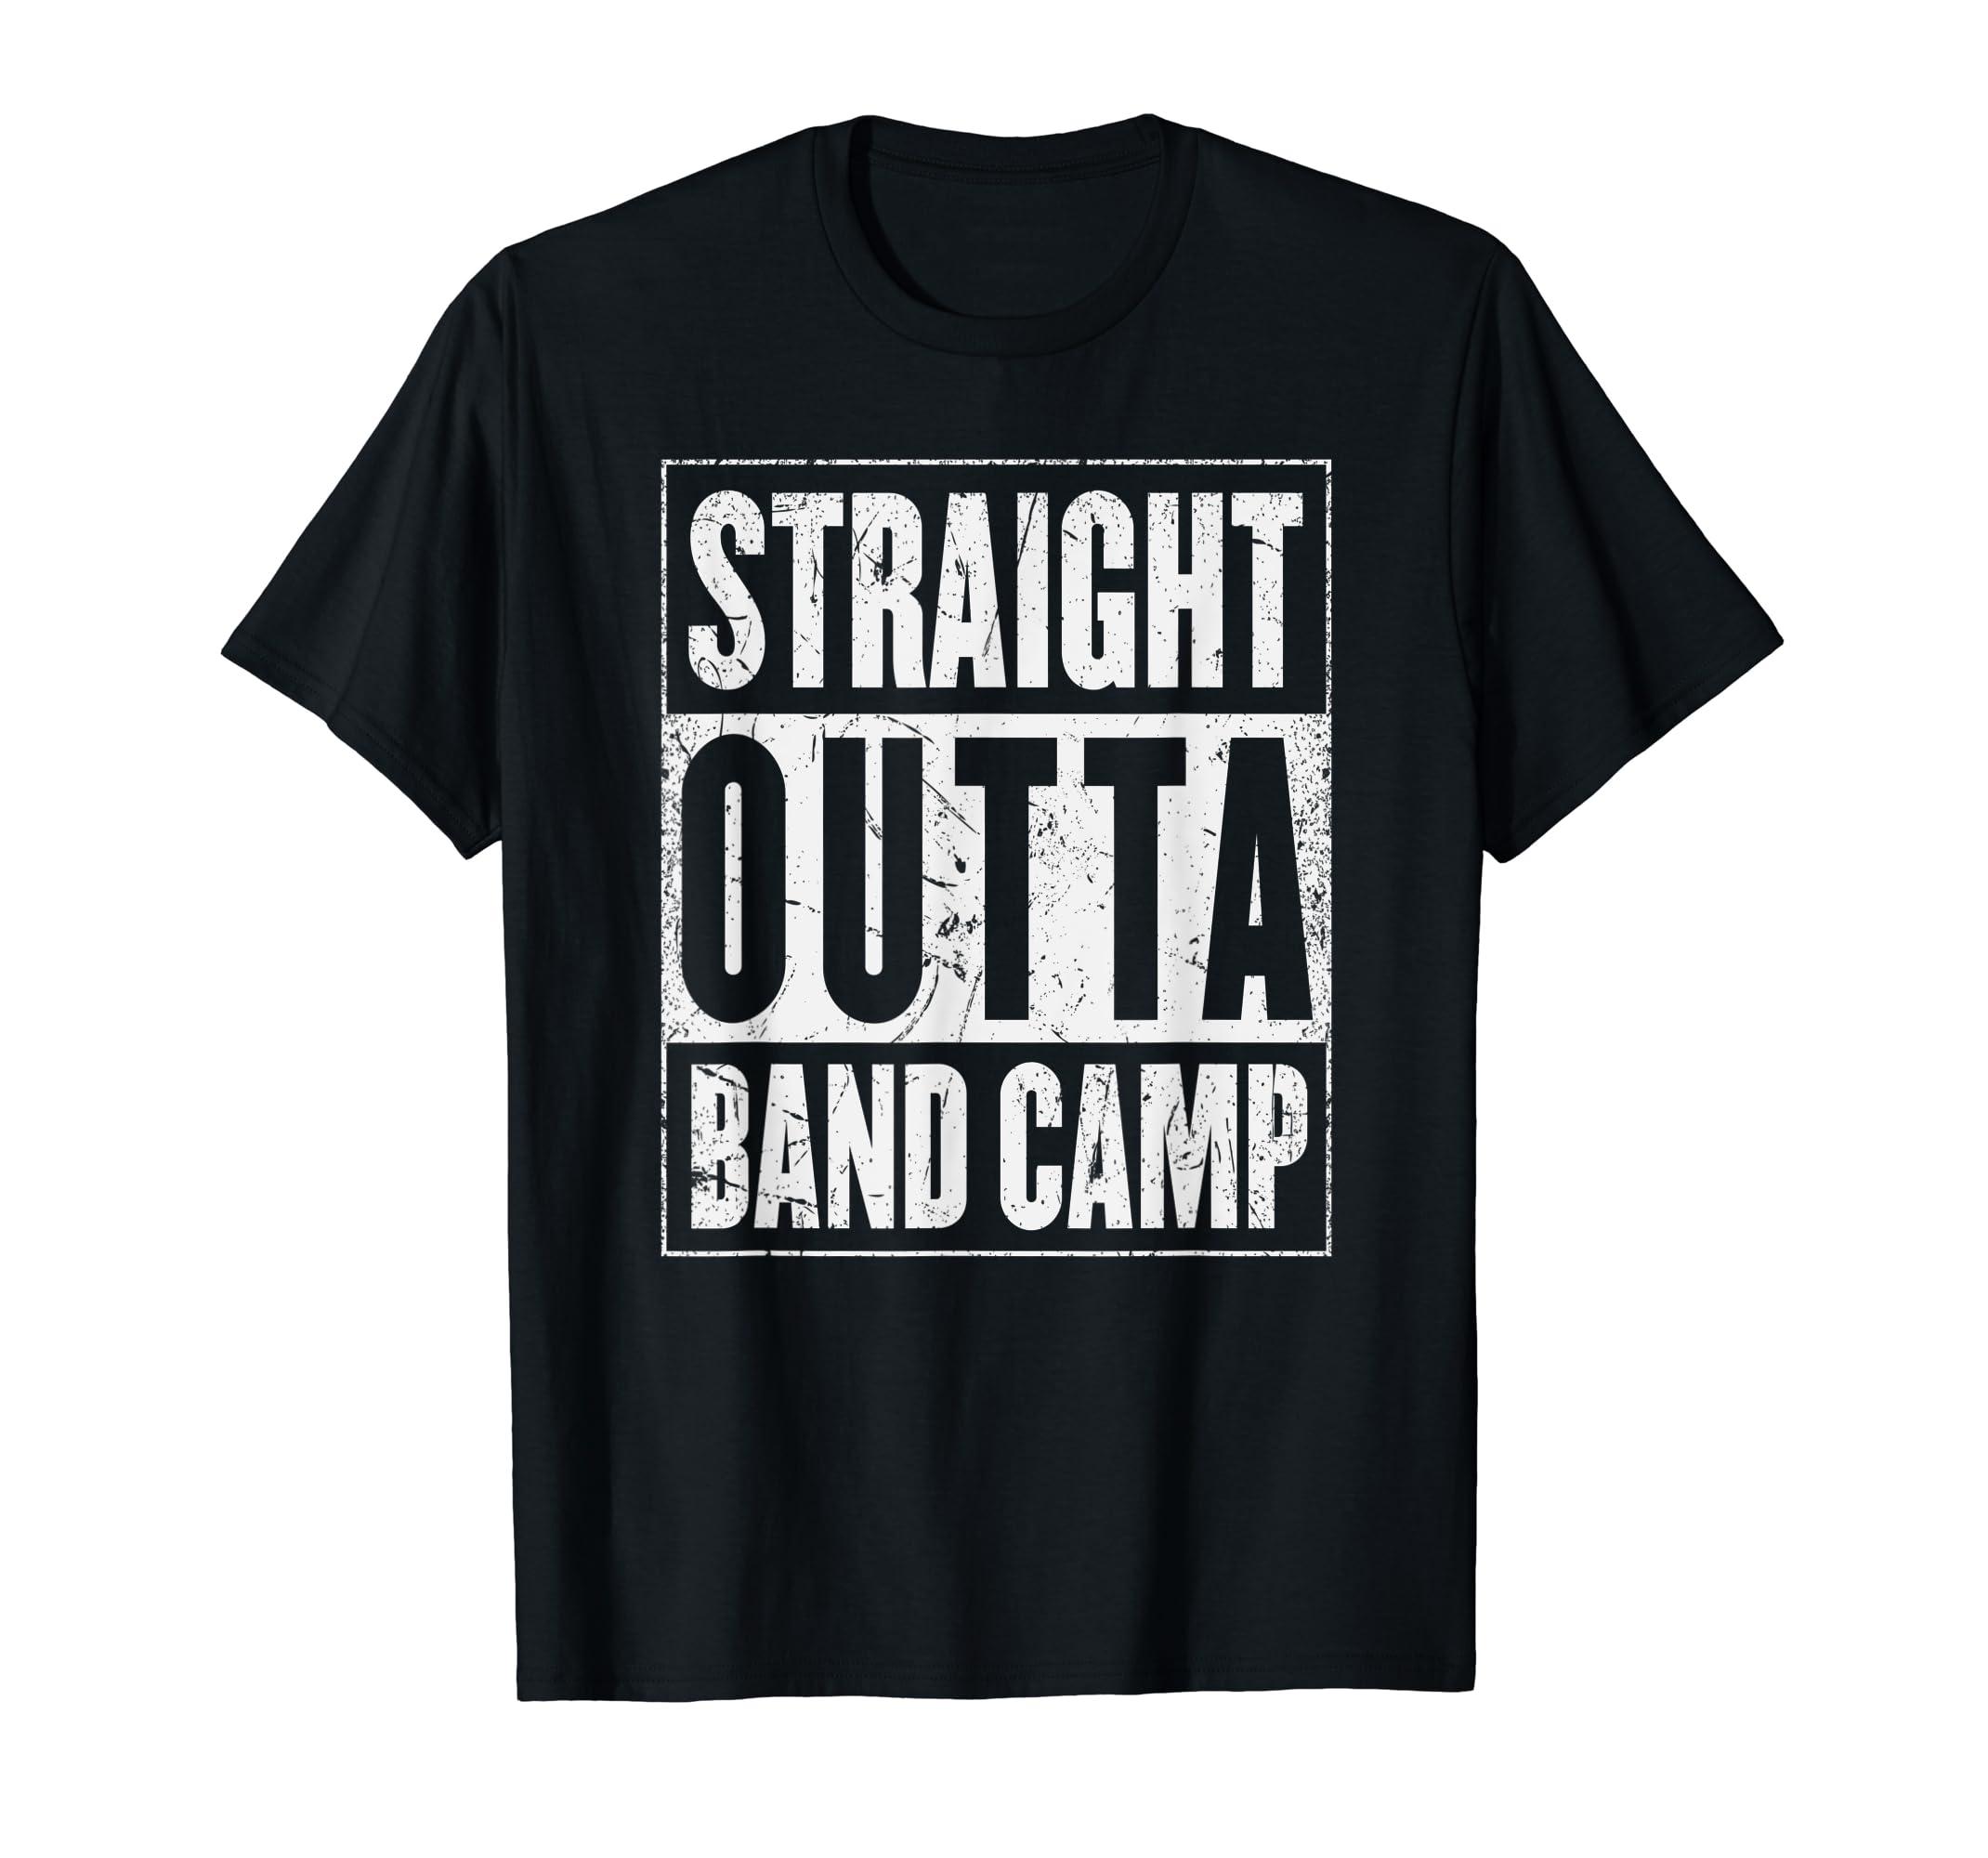 eb44e3377 Amazon.com: Straight Outta Band Camp Shirt | Original Distressed Look:  Clothing